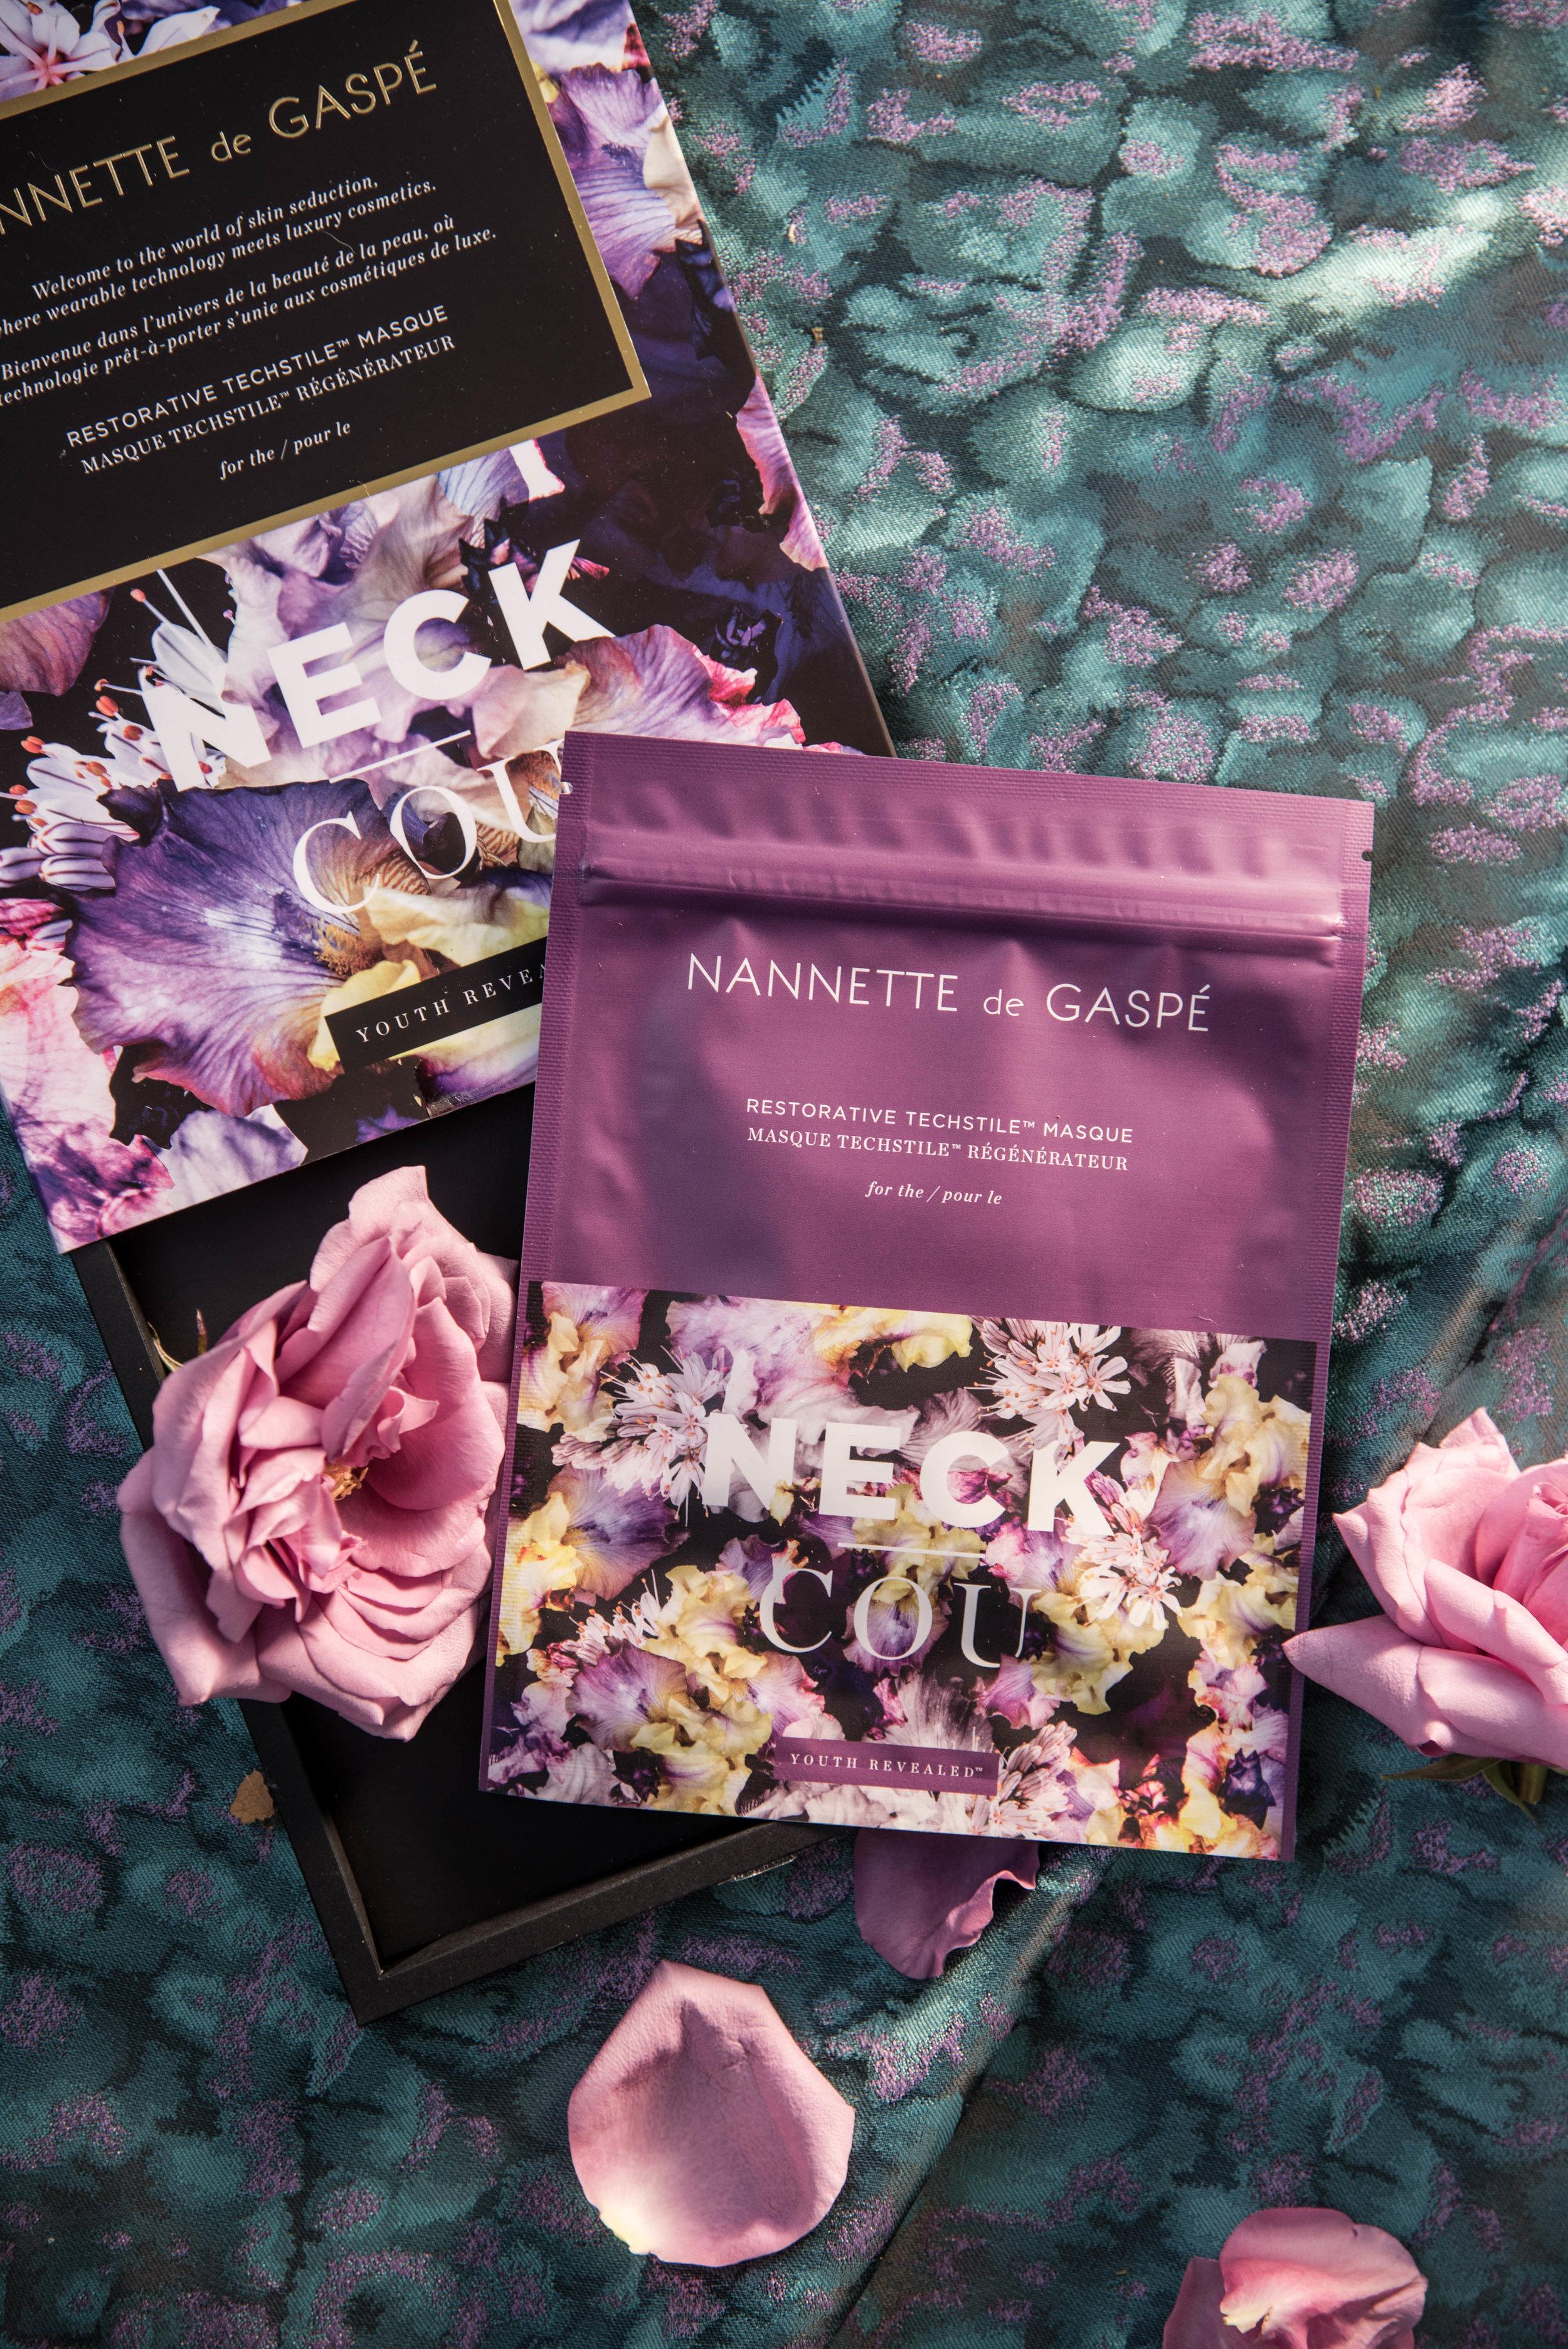 ROSE & IVY Journal Gift Guide 2016 The Mood Dark Florals Nanette de Gaspe Masque for the Neck